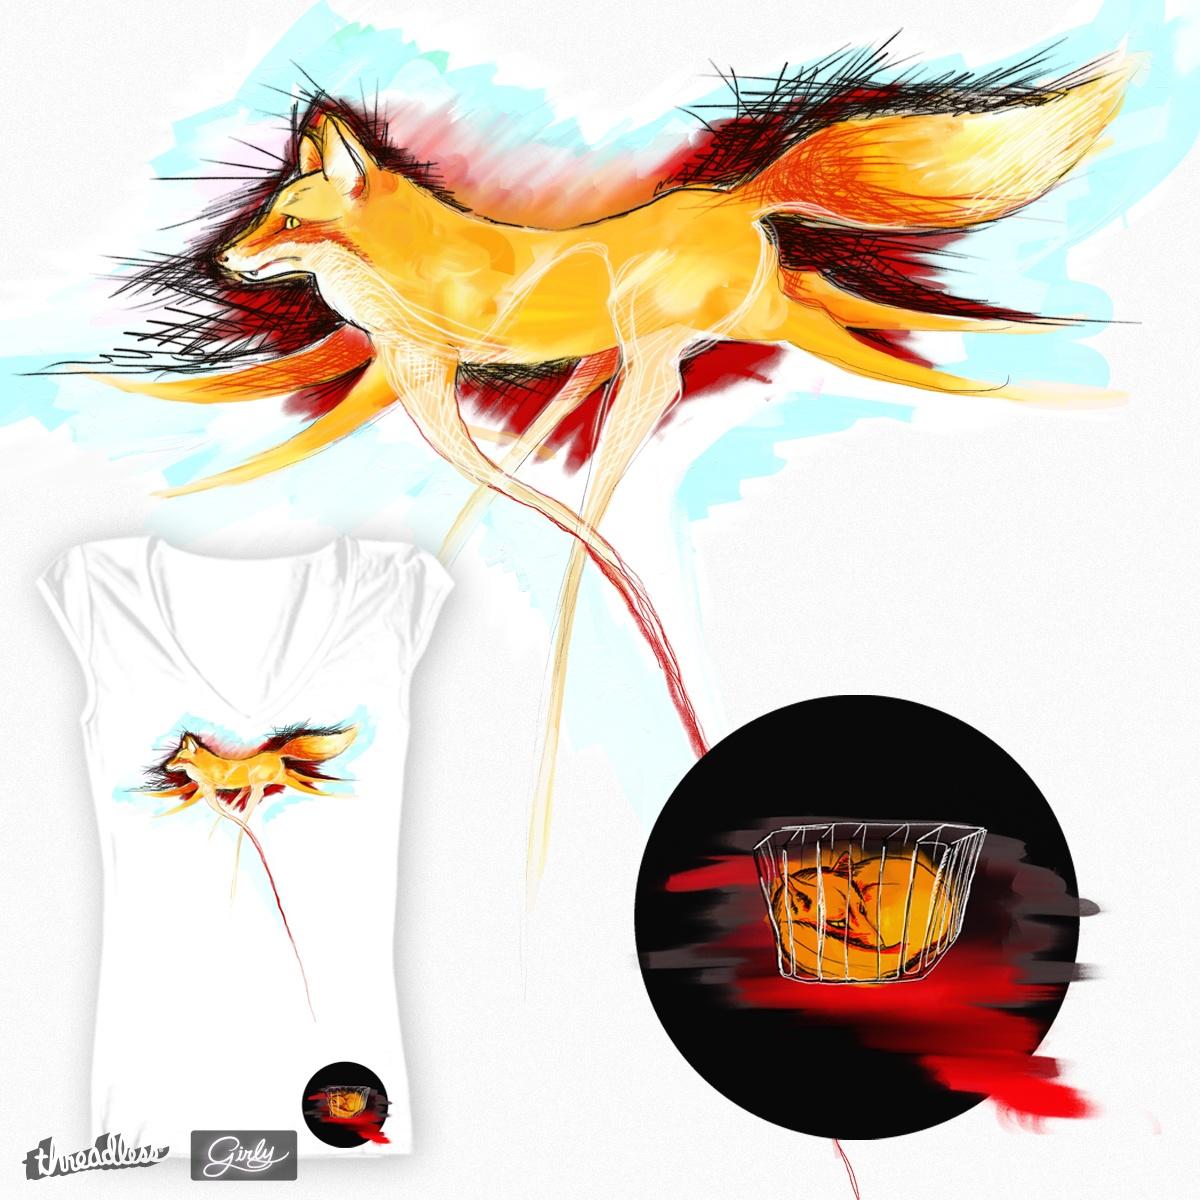 foxy life by LeniMo on Threadless